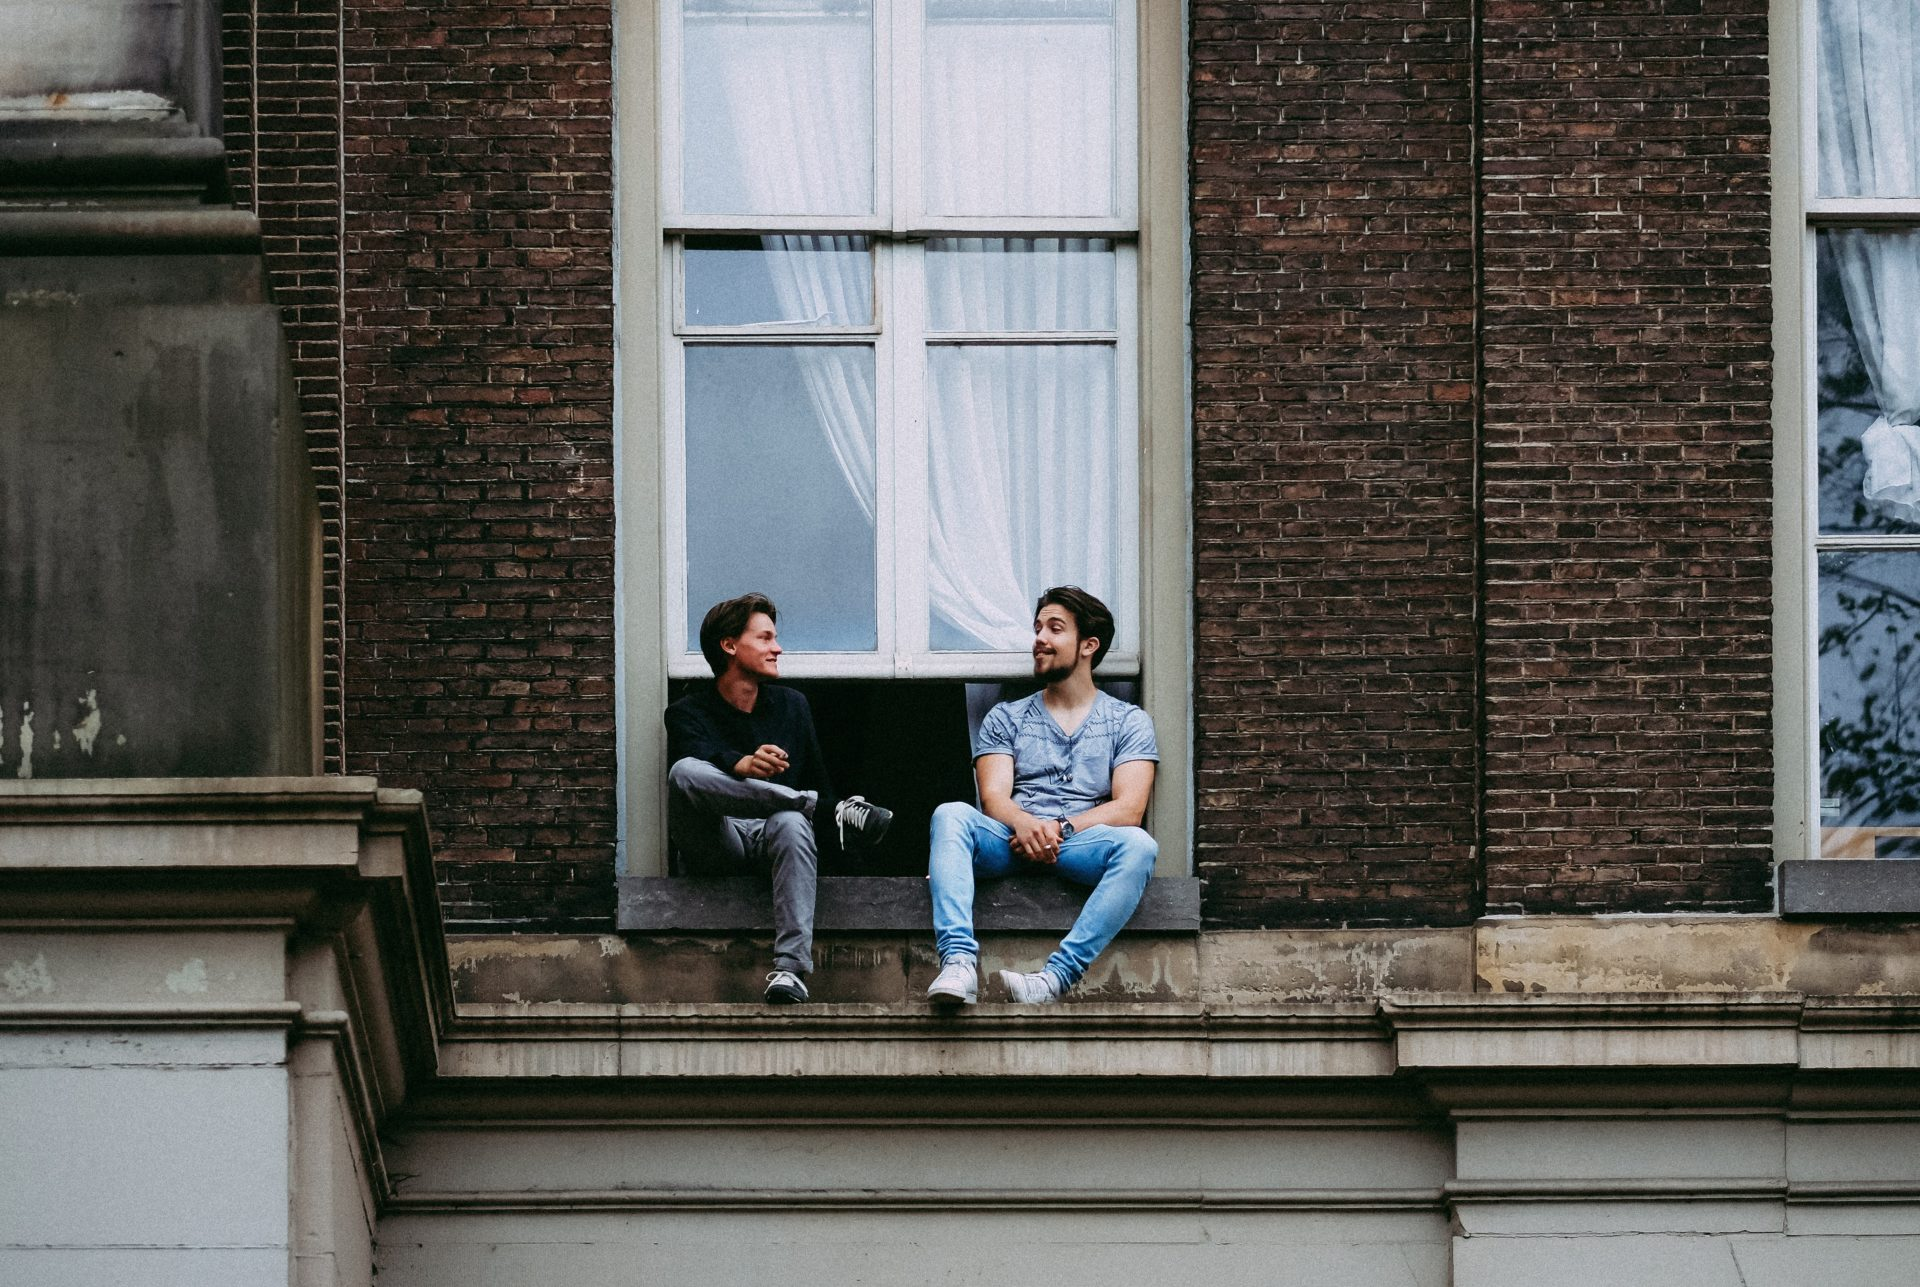 bohem housing co-living